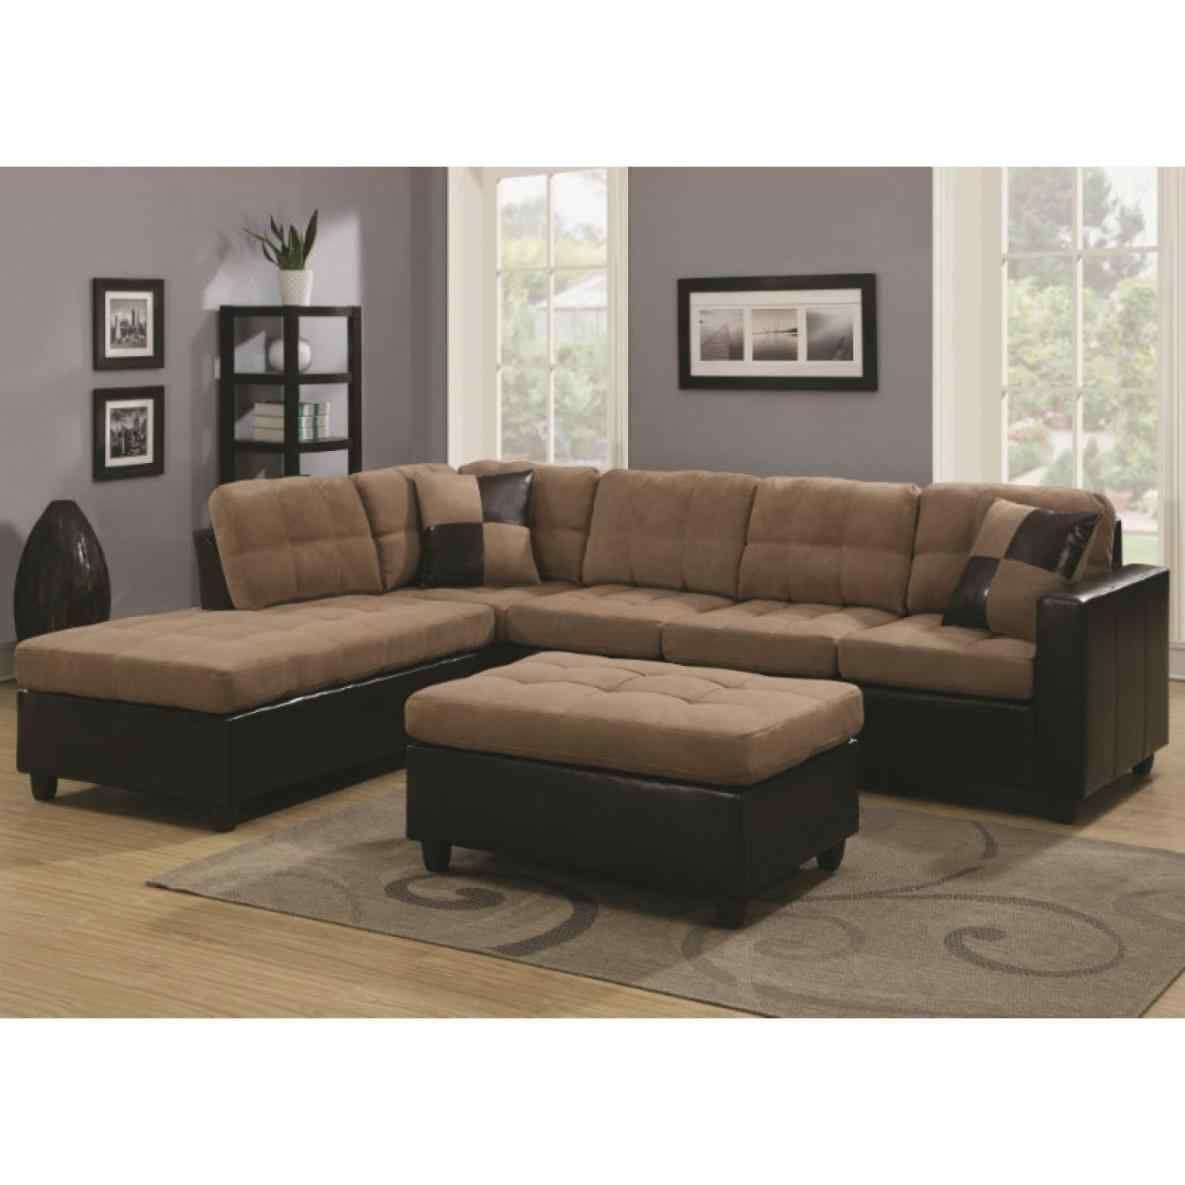 for nice cheap sectional sofas sale l shaped sleeper sofa u interior design l